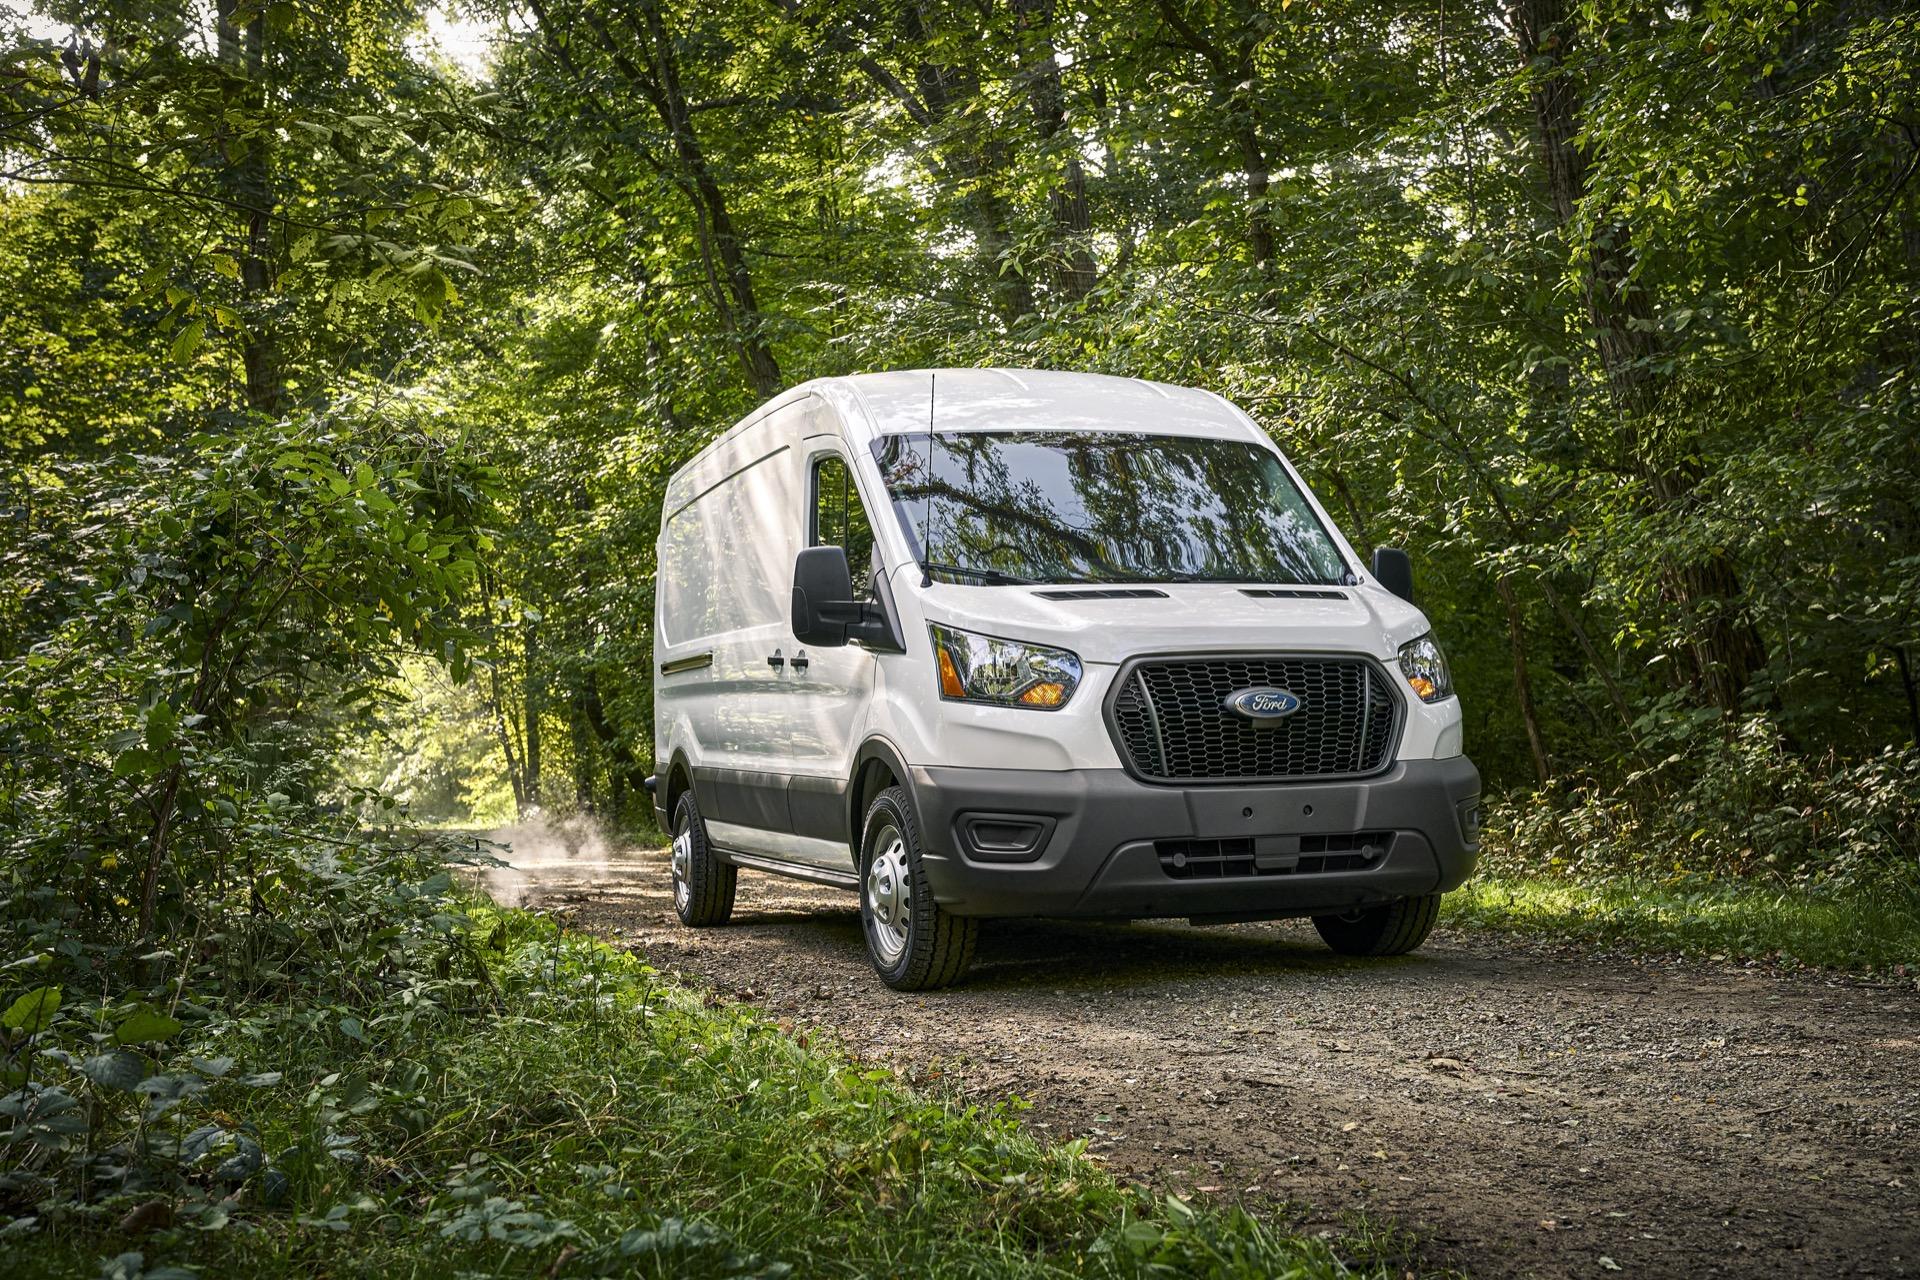 2021 Ford Transit Van Recreates The Mobile Home And Work Van